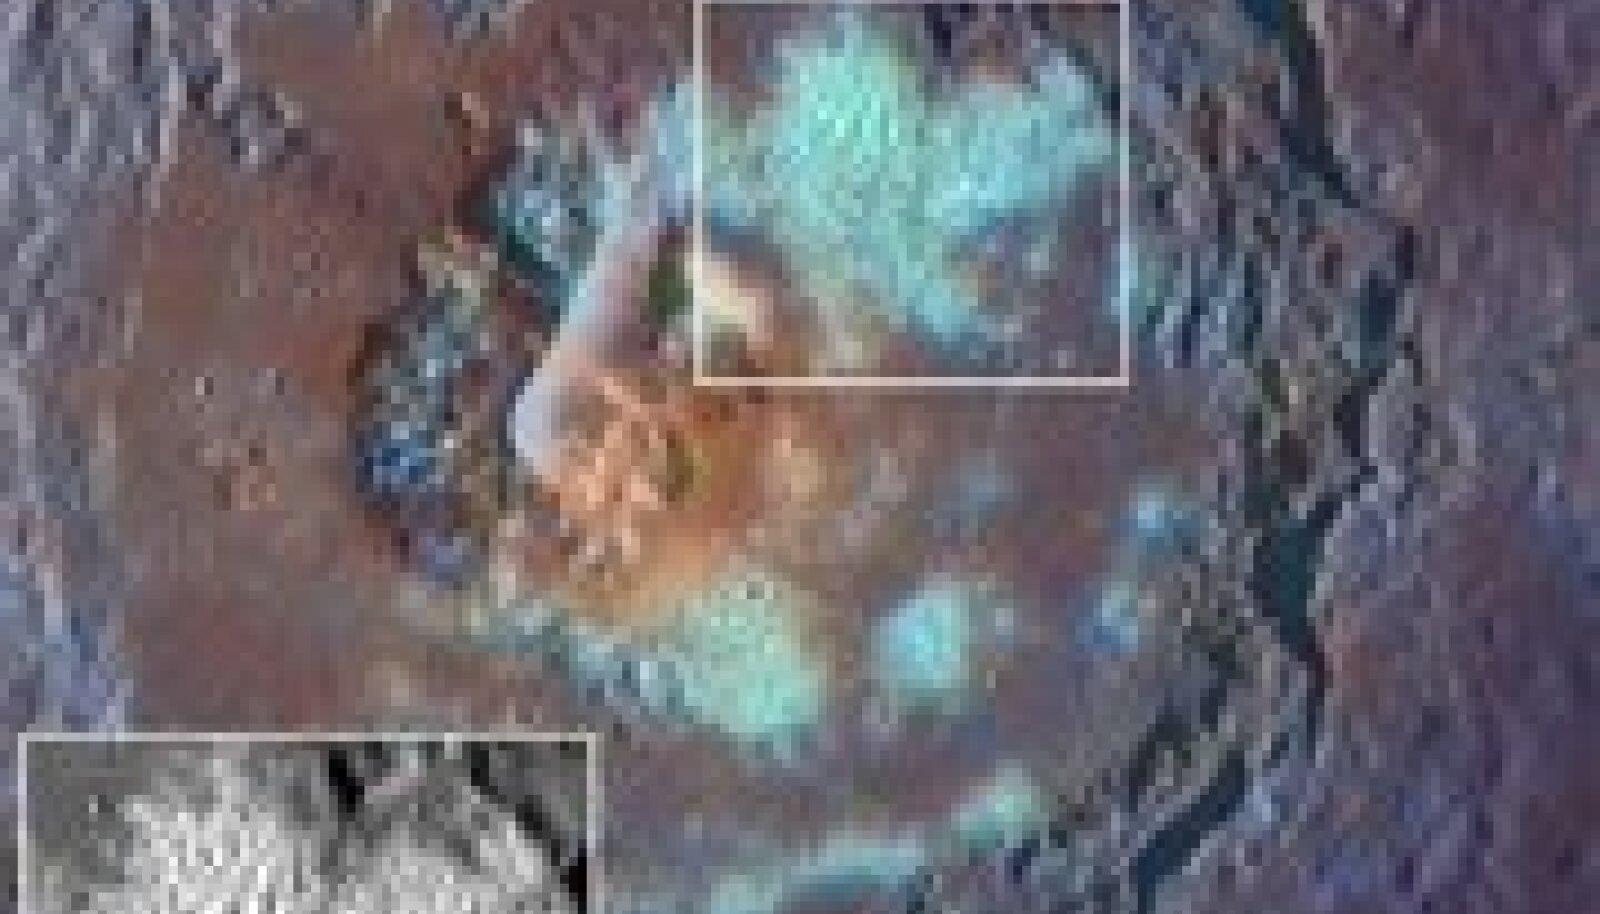 Messengeri pilt Merkuuri kraatritest. Foto: NASA; Reuters